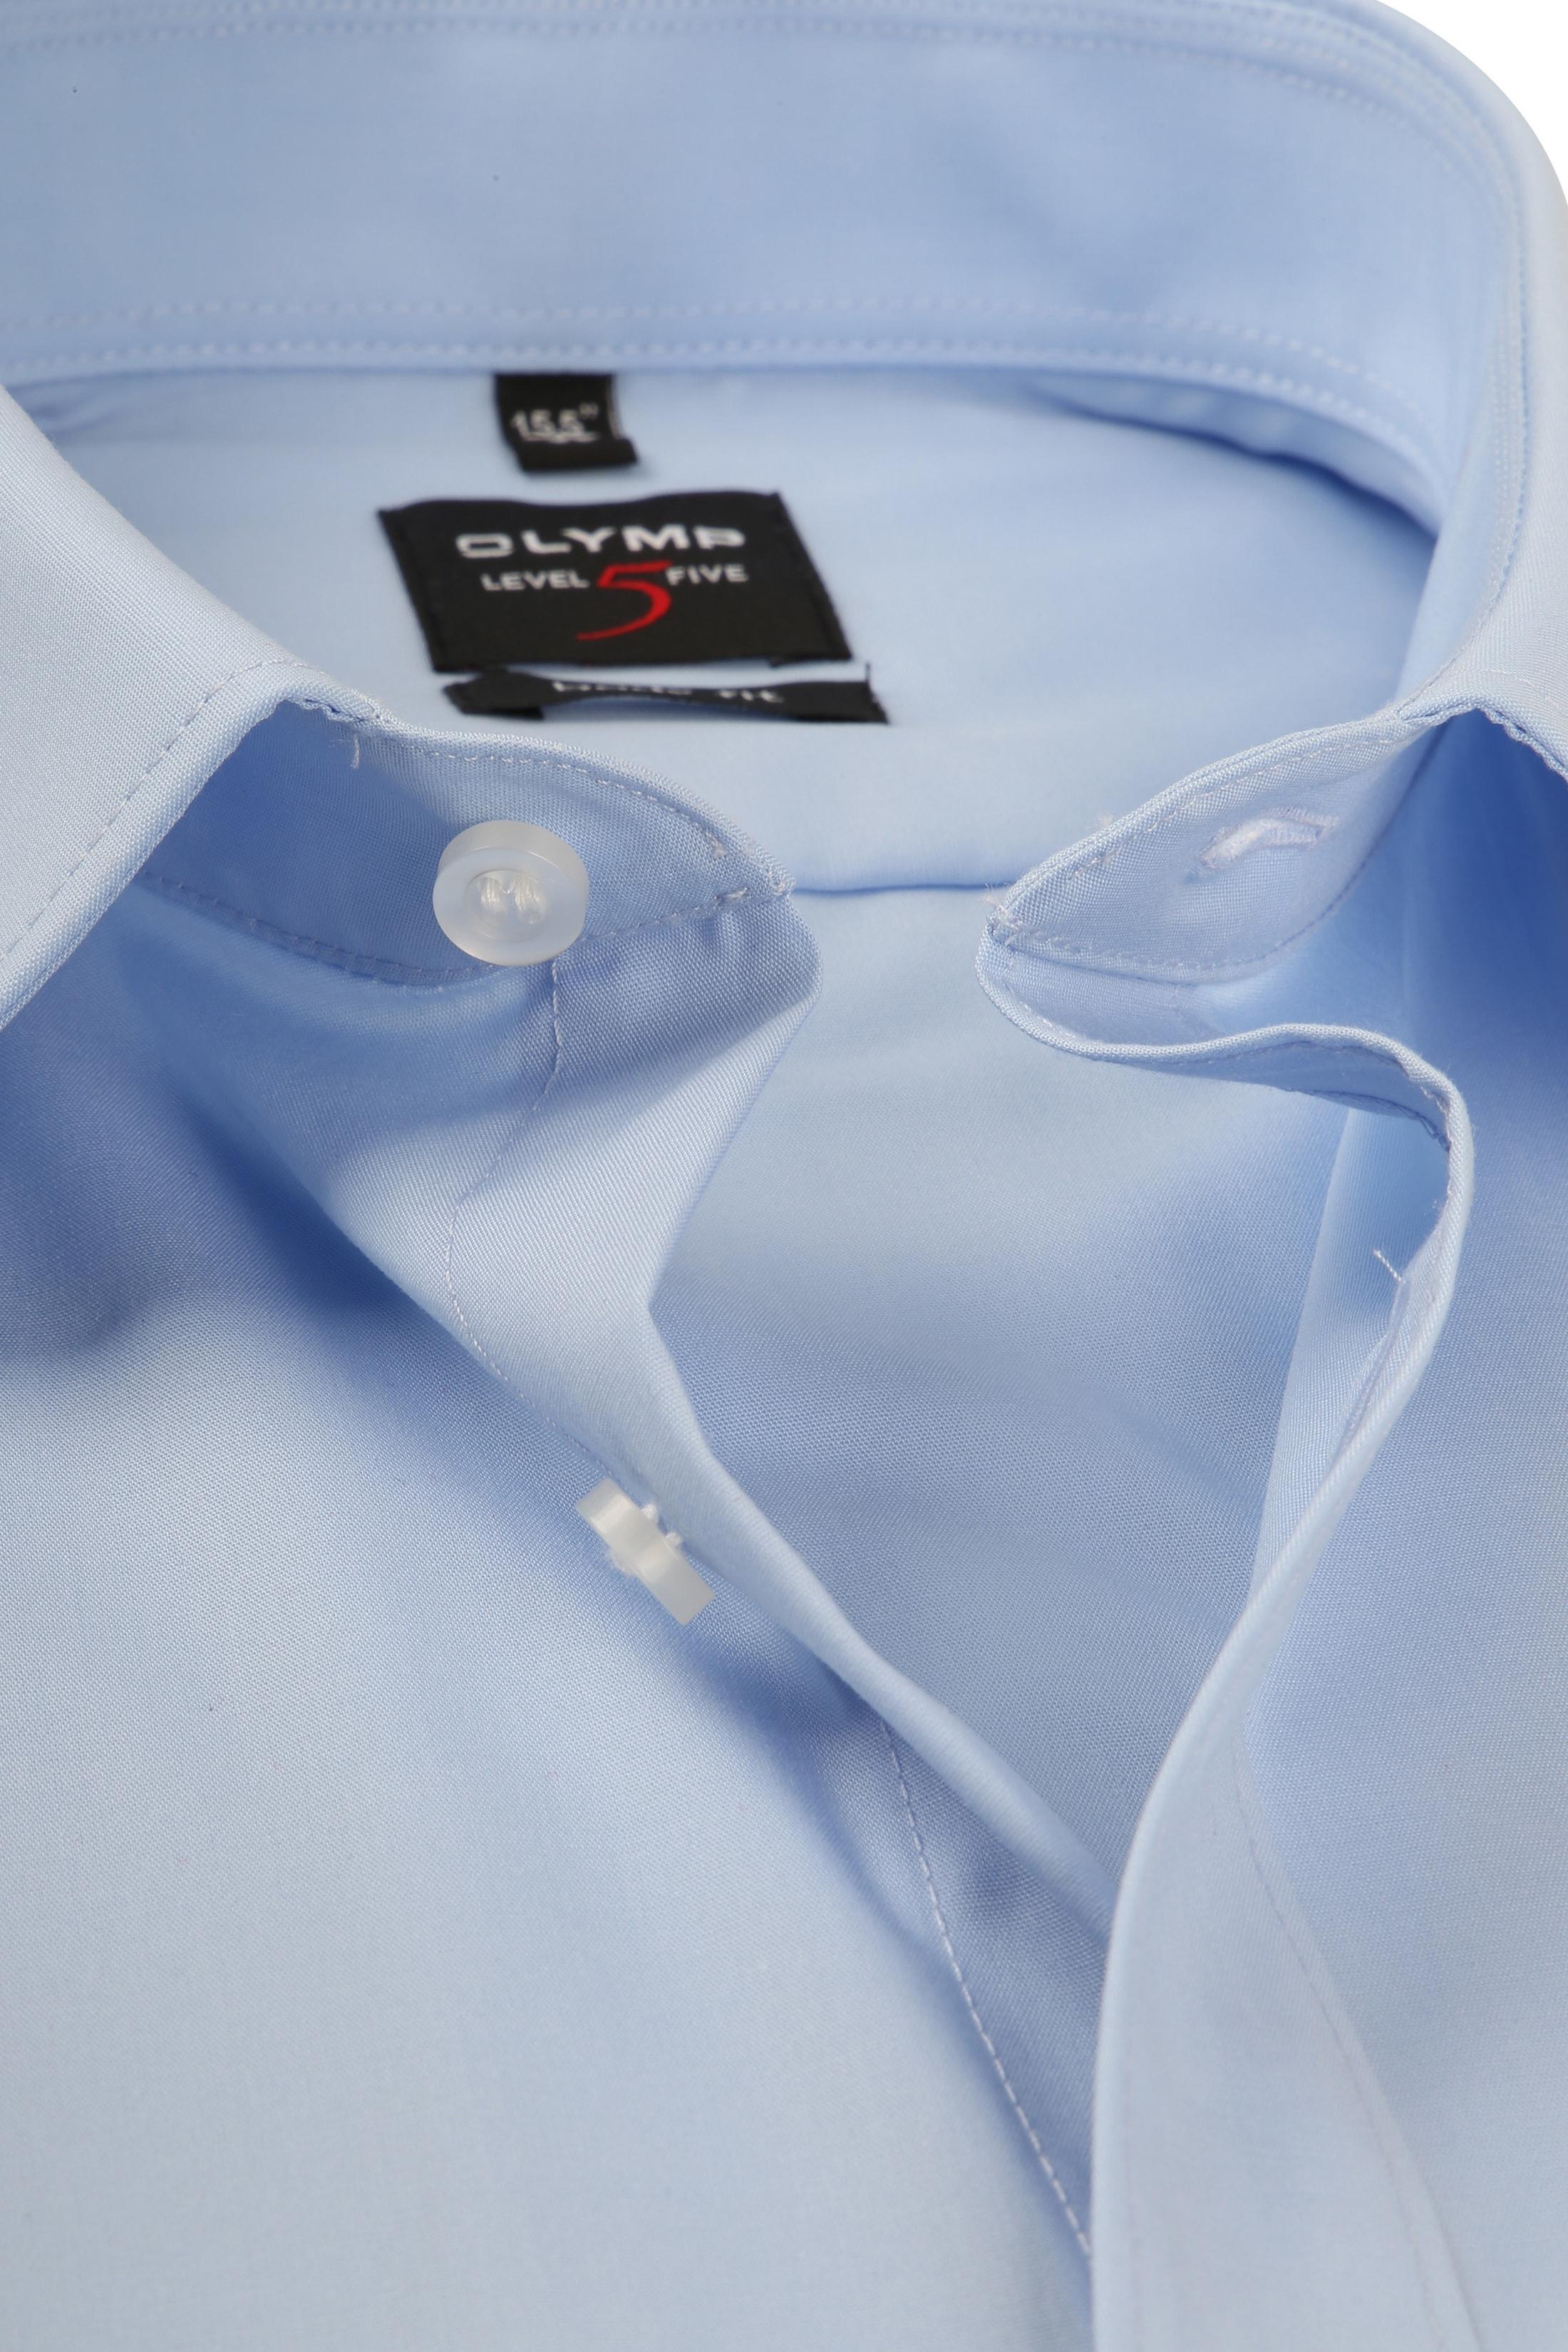 OLYMP Overhemd Blauw Body Fit foto 1